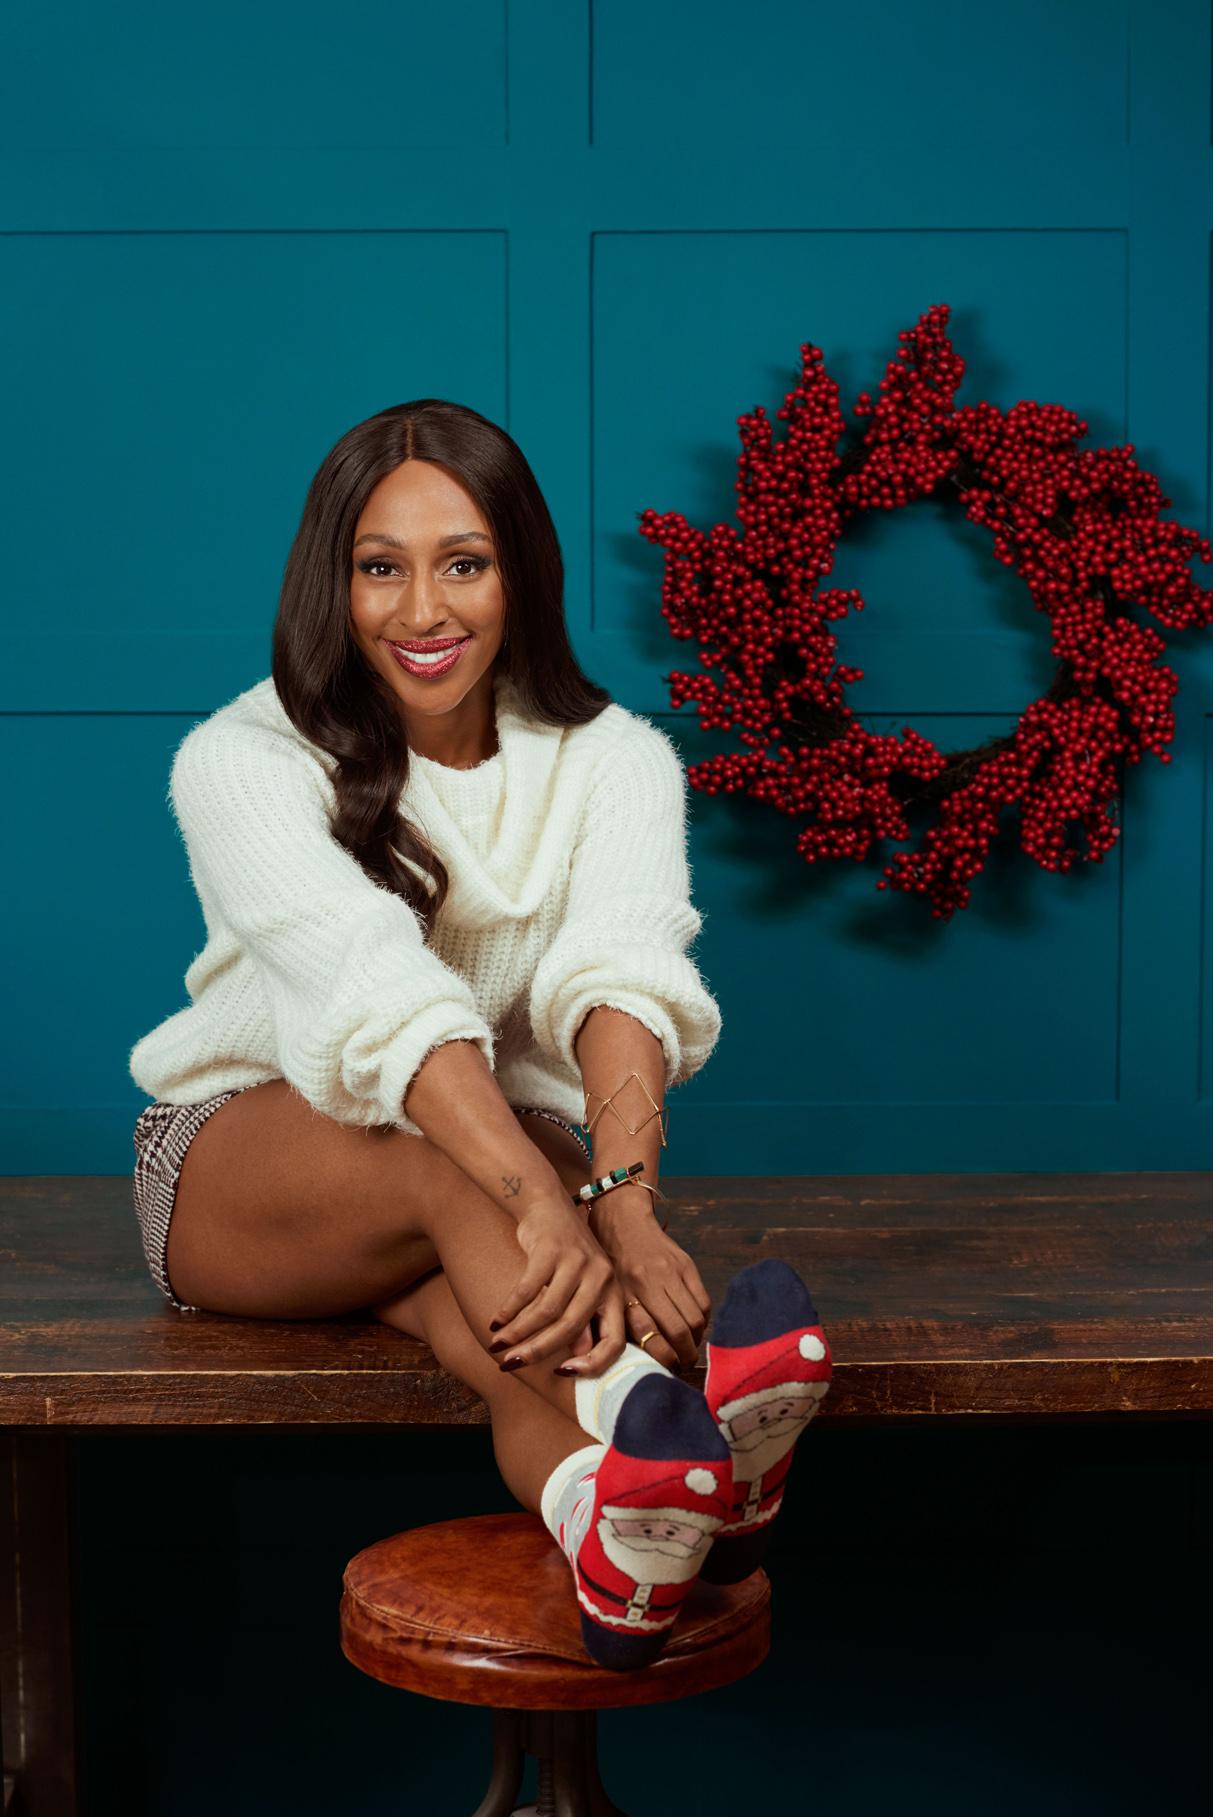 Alexandra Burke poses for TK Maxx's Christmas Sock campaign #socksie (Mikael Buck/TK Maxx/PA)